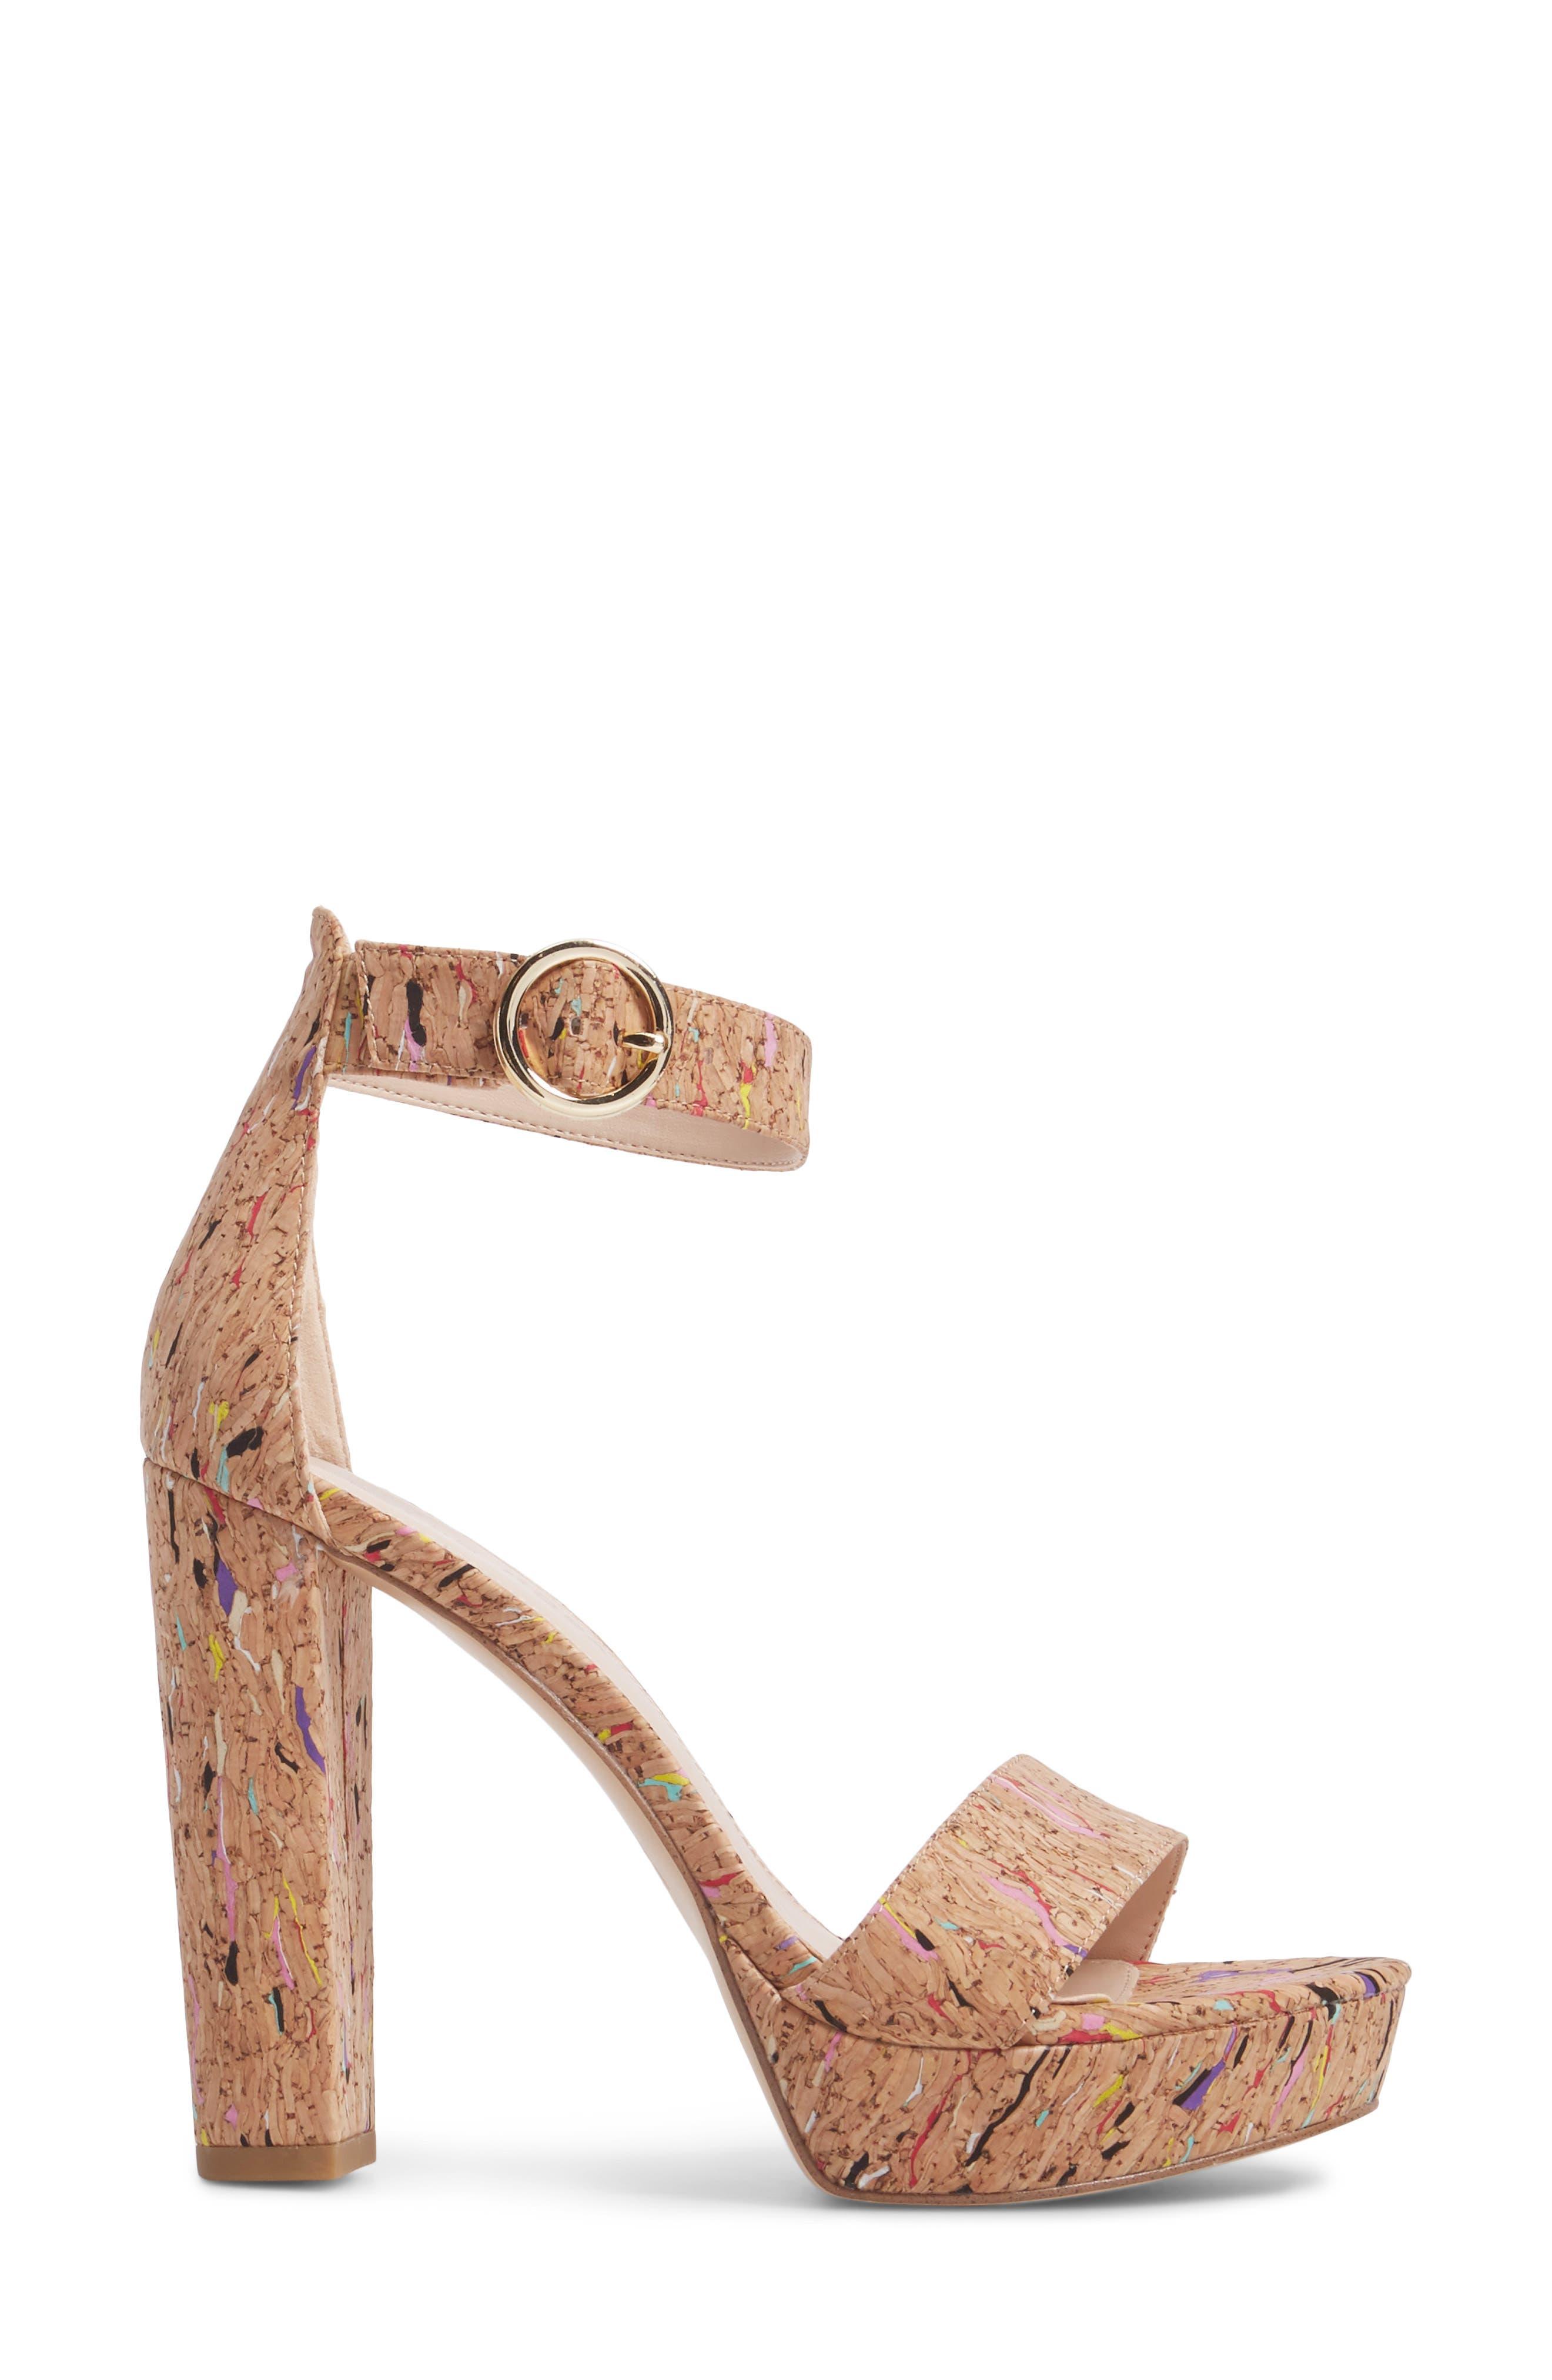 Palo 2 Platform Sandal,                             Alternate thumbnail 3, color,                             MULTI  CORK